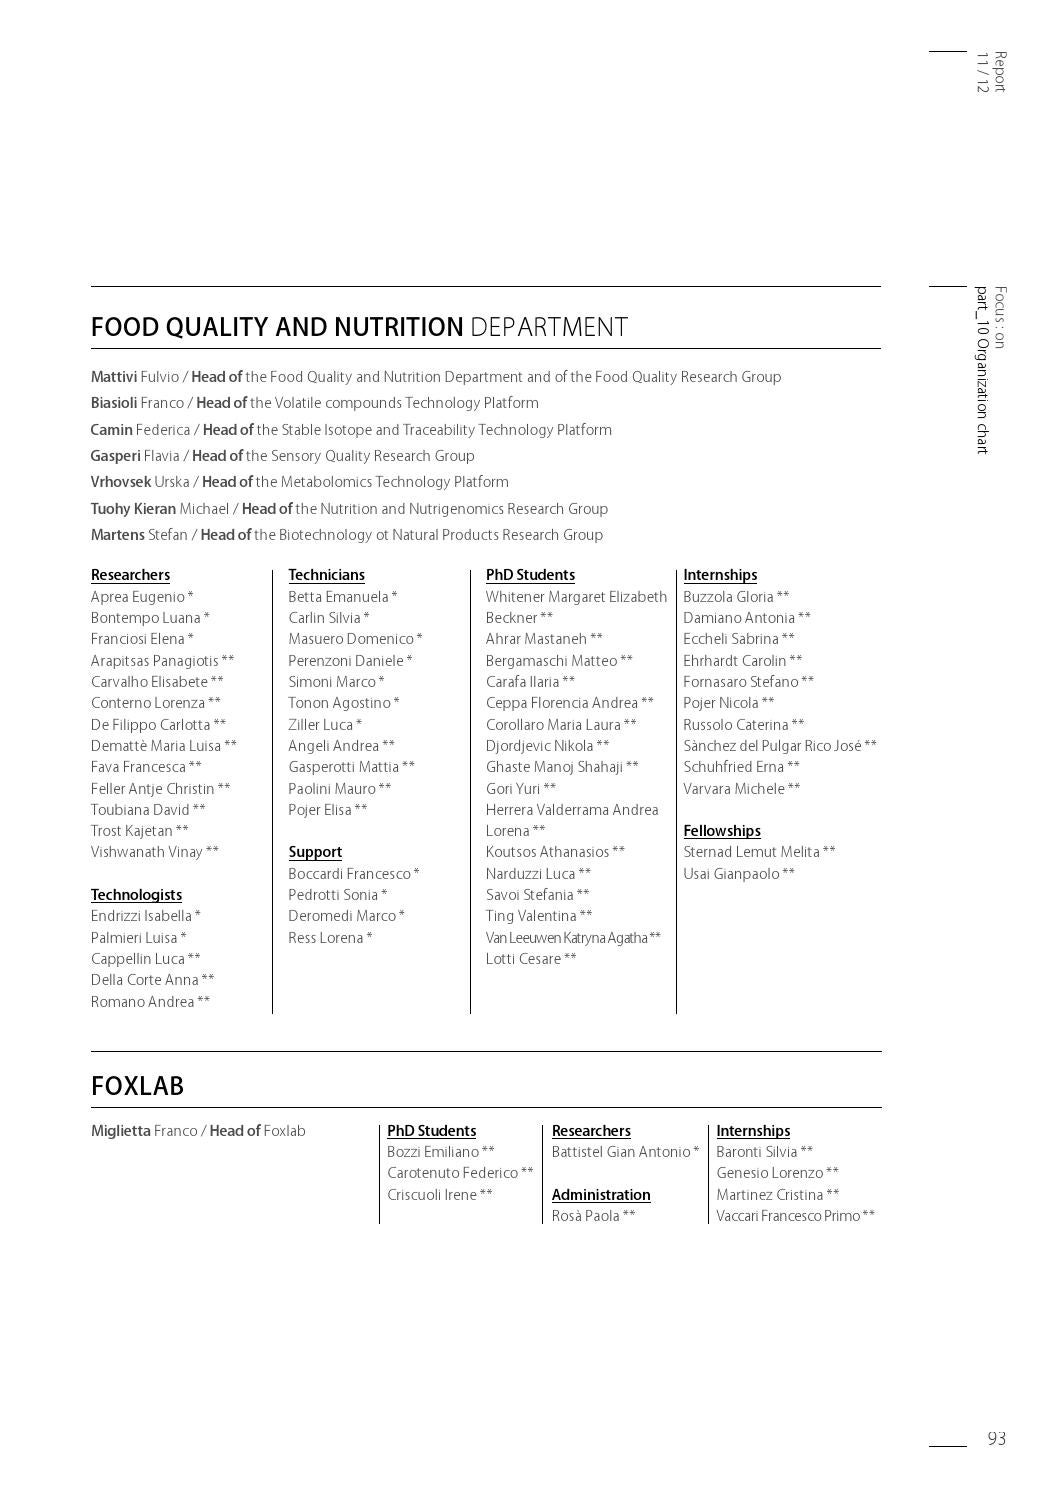 RESEARCH AND INNOVATION CENTRE ANNUAL REPORT - ENGLISH VERSIONE by  Fondazione Edmund Mach - issuu 00a746d252c0